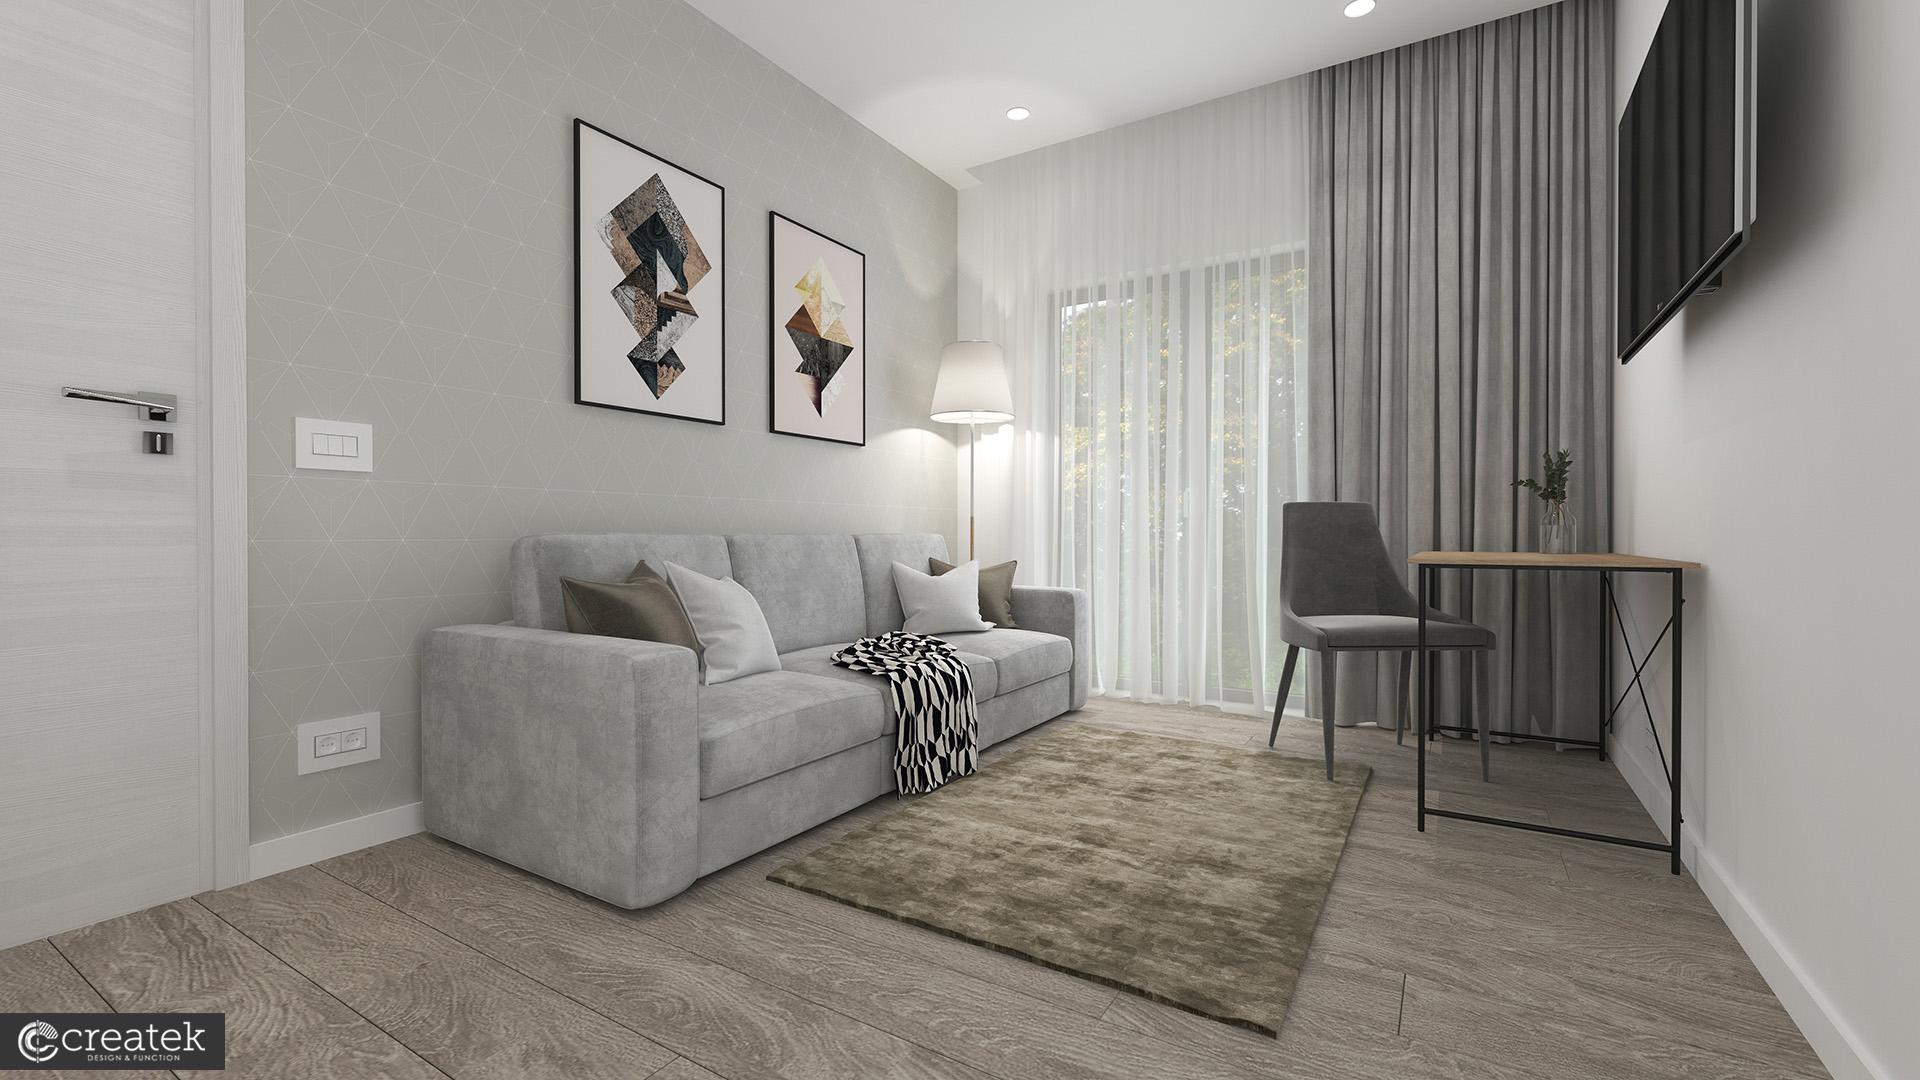 043-Dormitor-Oaspeti-Interior-Casa-Ovidiu-Lac